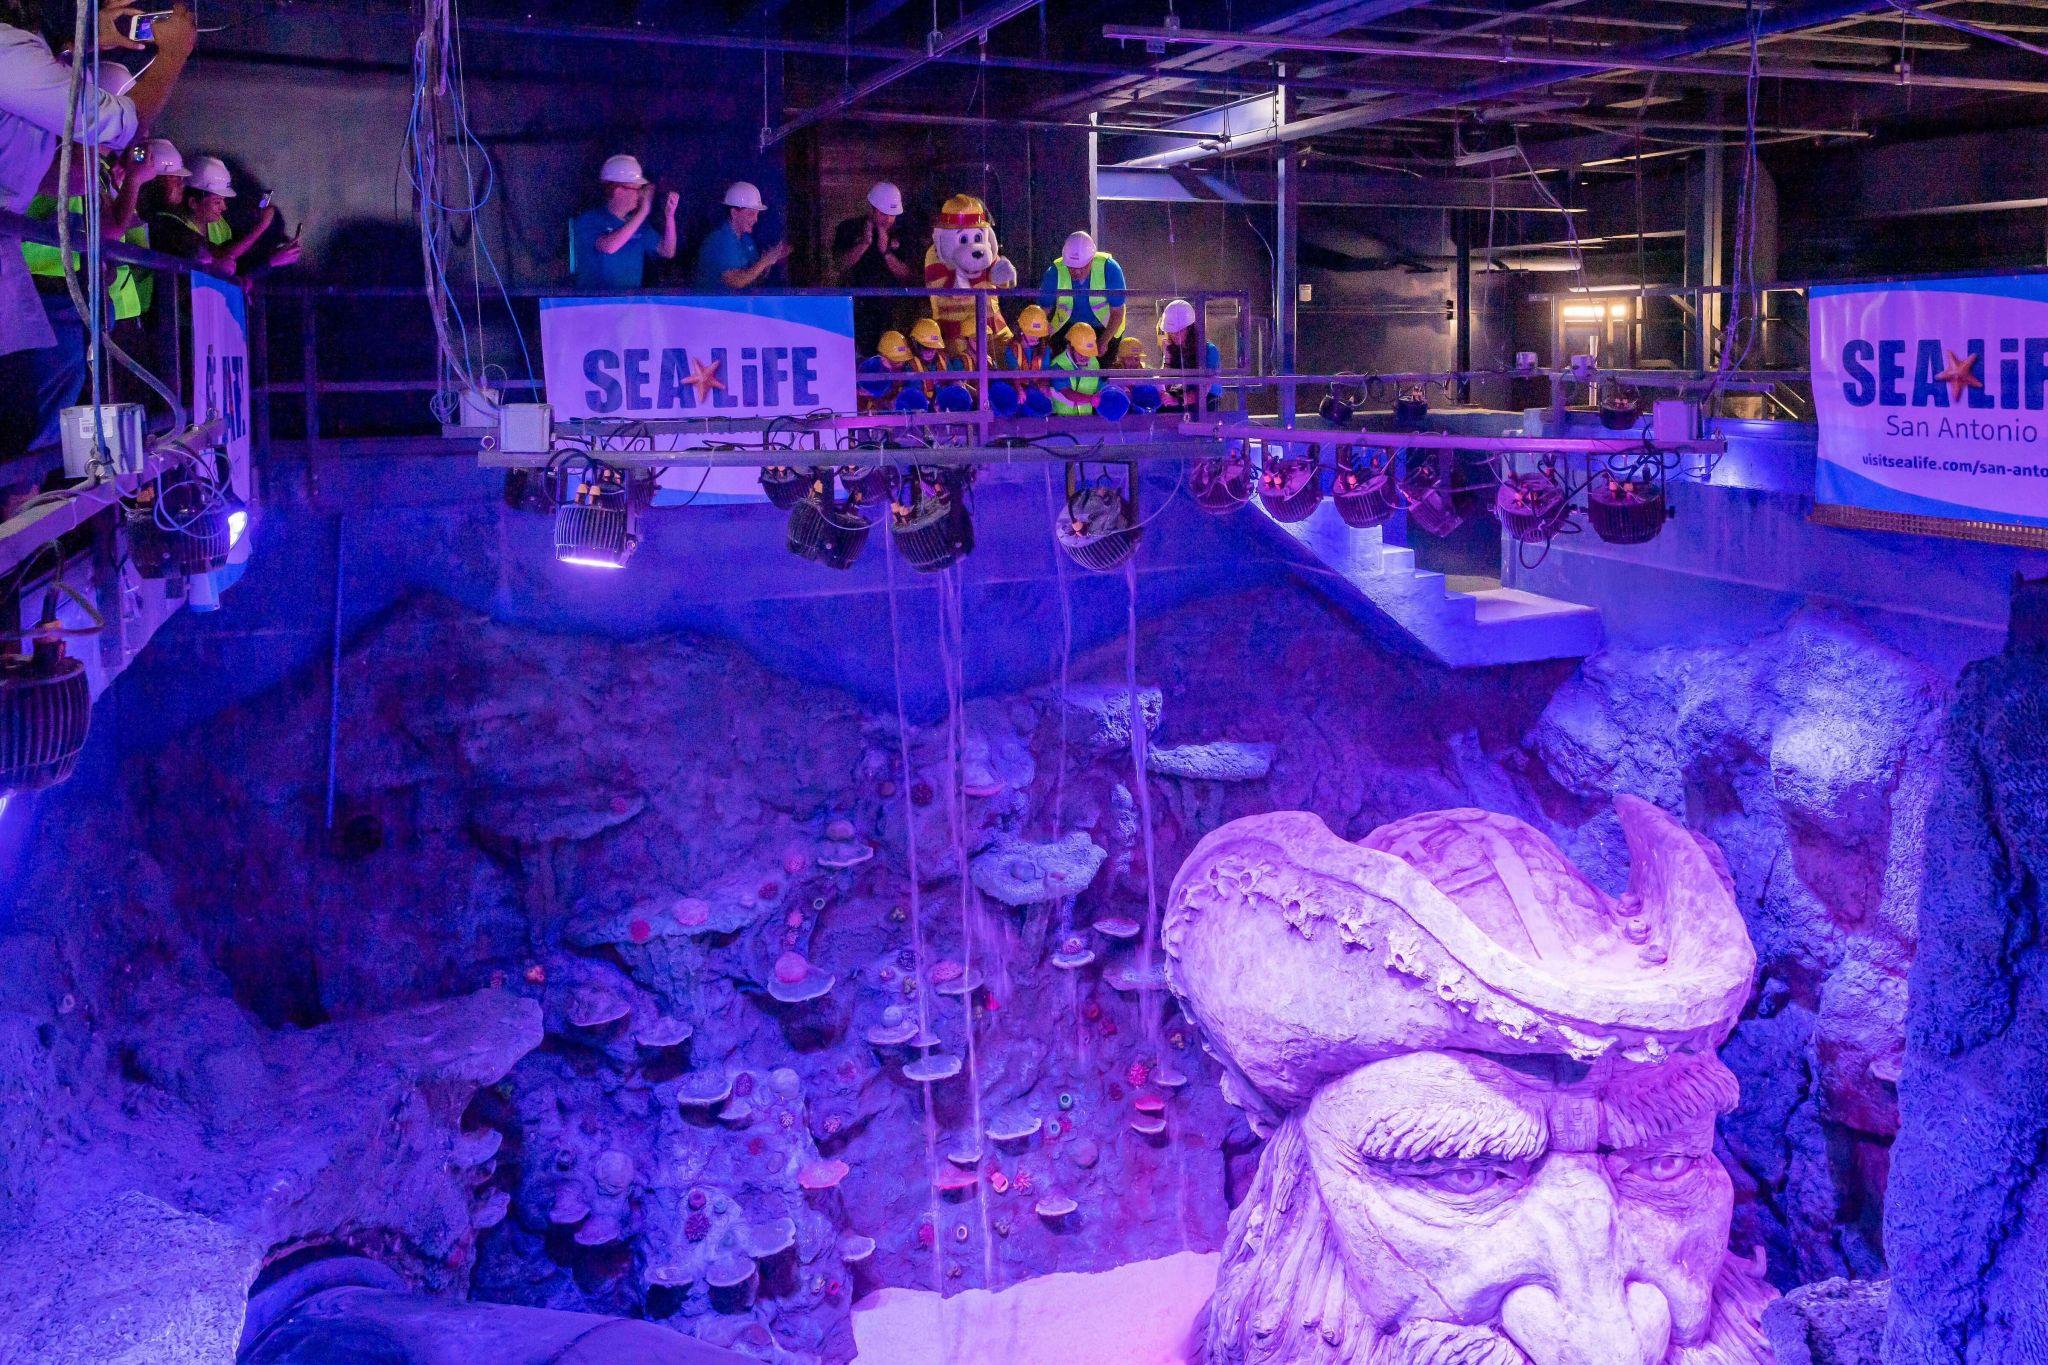 SEA LIFE Aquarium San Antonio begins to fill its 155,000-gallon ocean tank